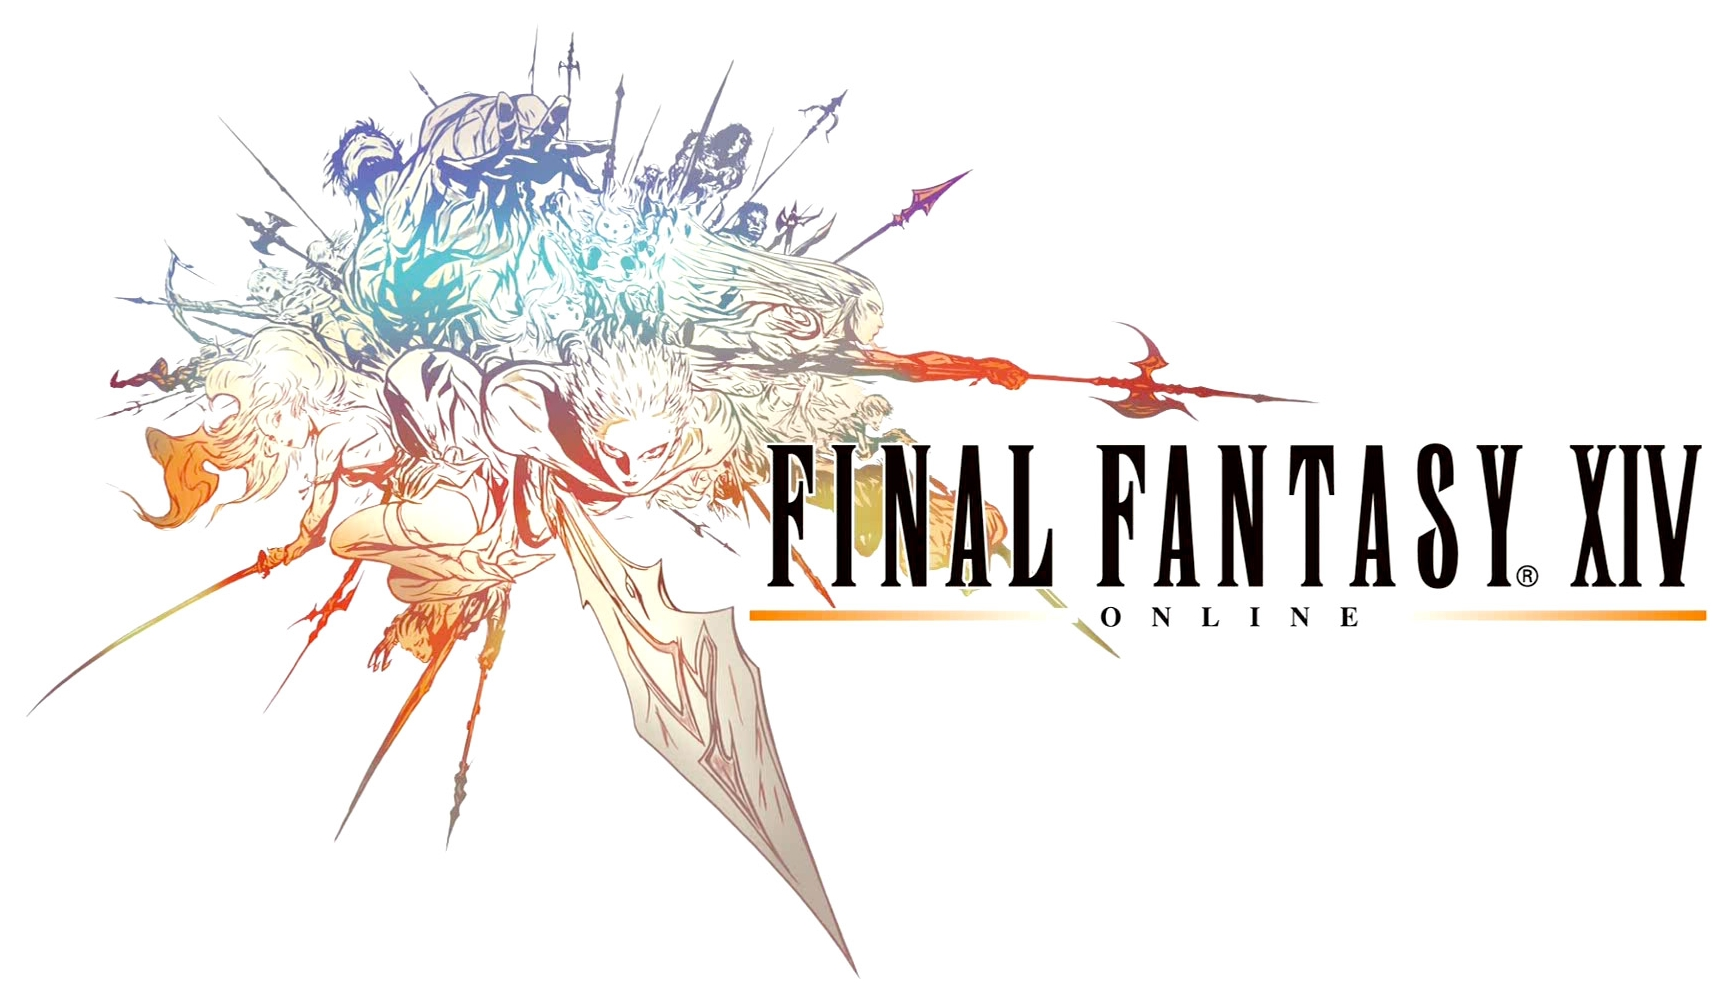 Llegan Nuevos Screen Shots de Final Fantasy XIV